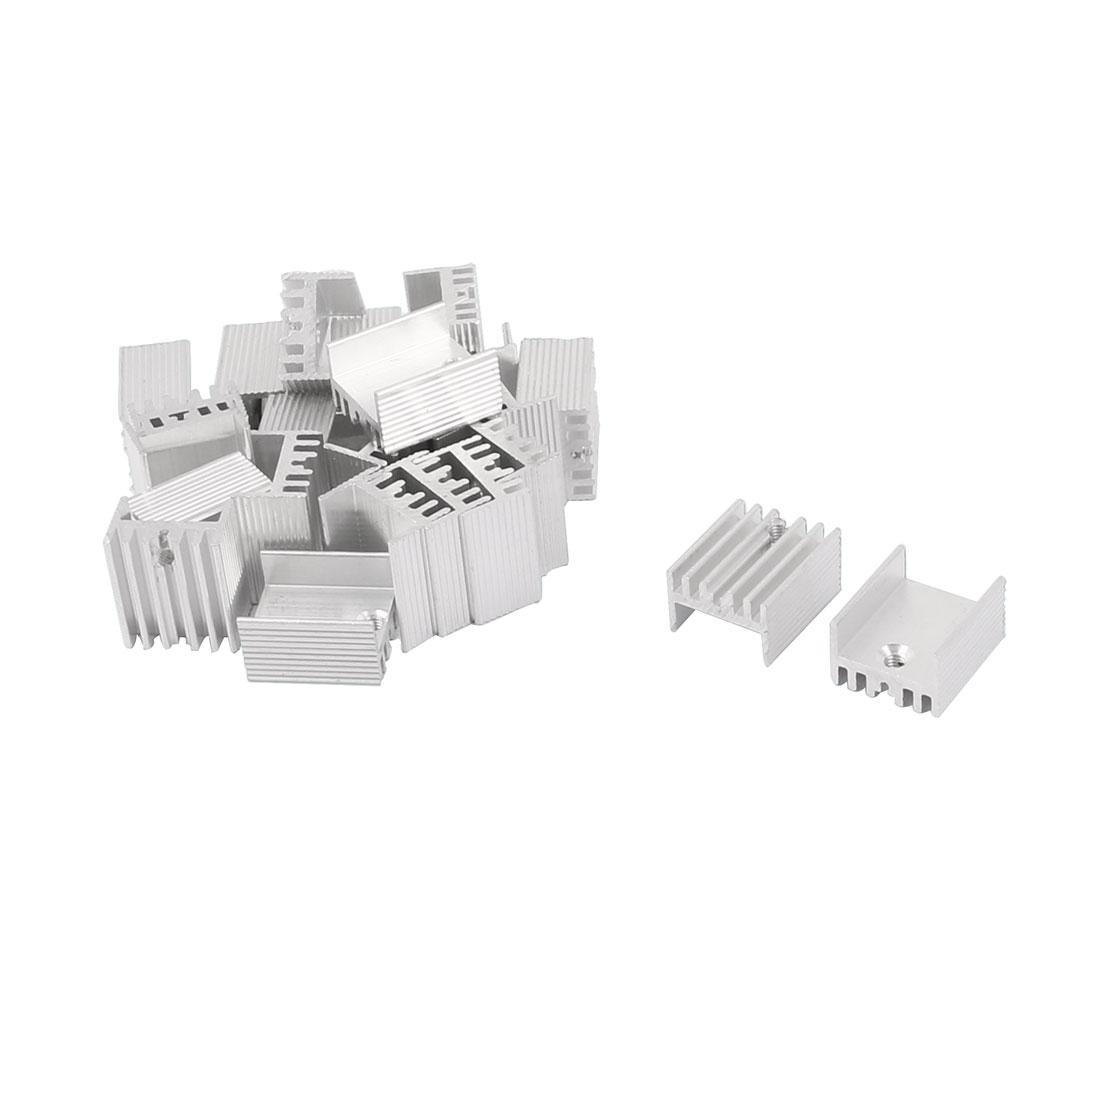 17mm x 15mm x 10mm Silver Tone Aluminium Power Amplifier Heat Sink Radiator Heatsink 25pcs